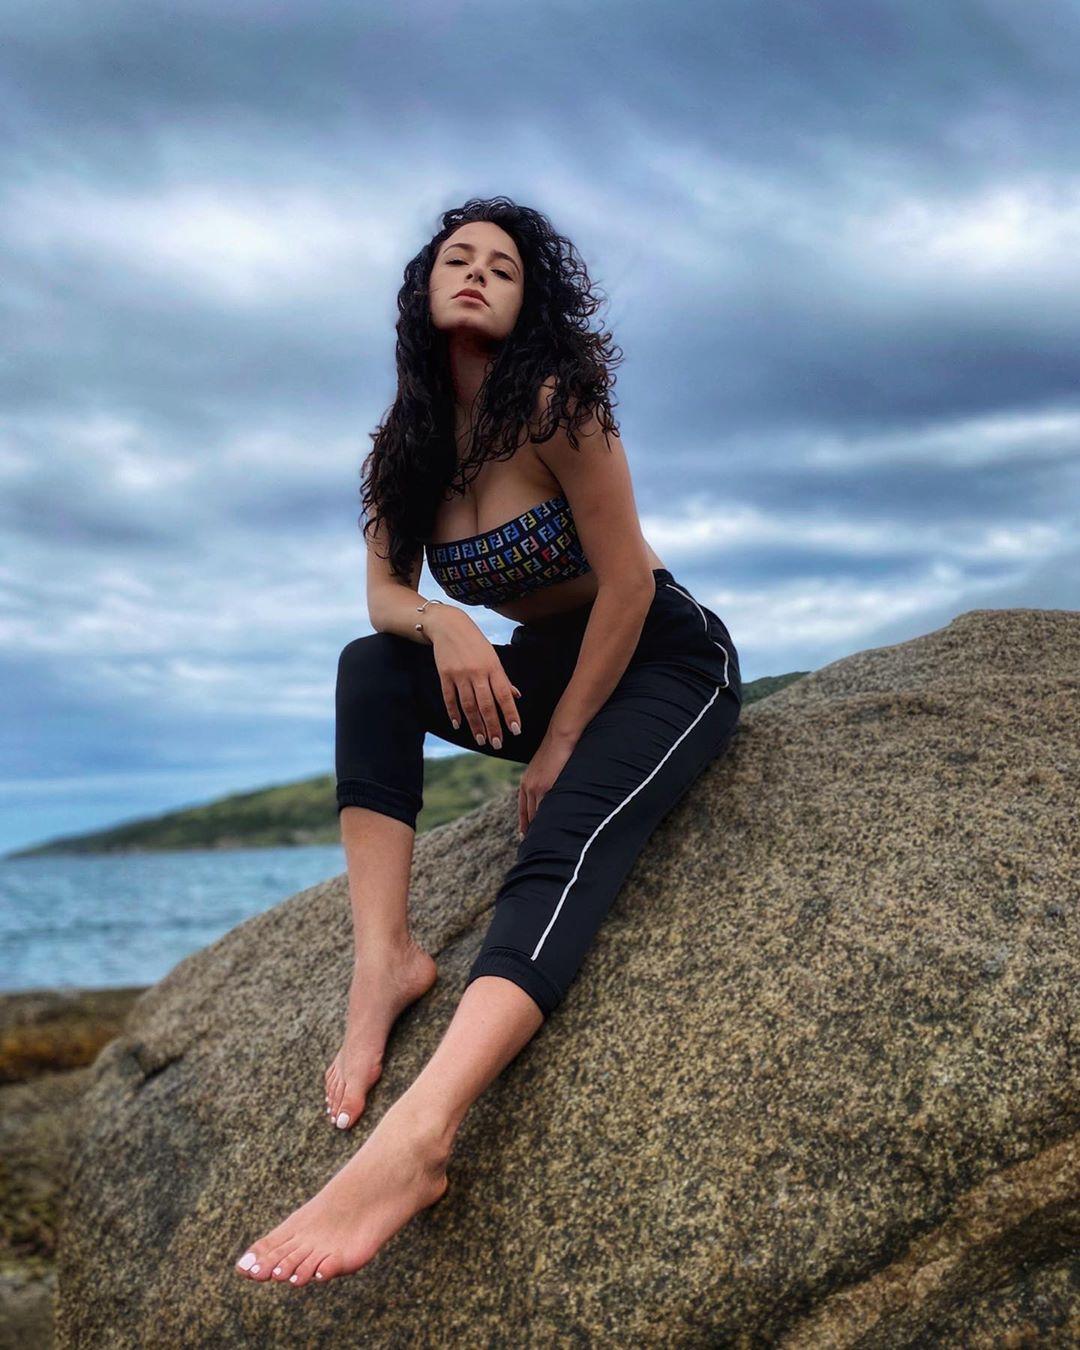 julia gama, miss brasil universo 2020/top 11 de miss world 2014. - Página 3 10613910